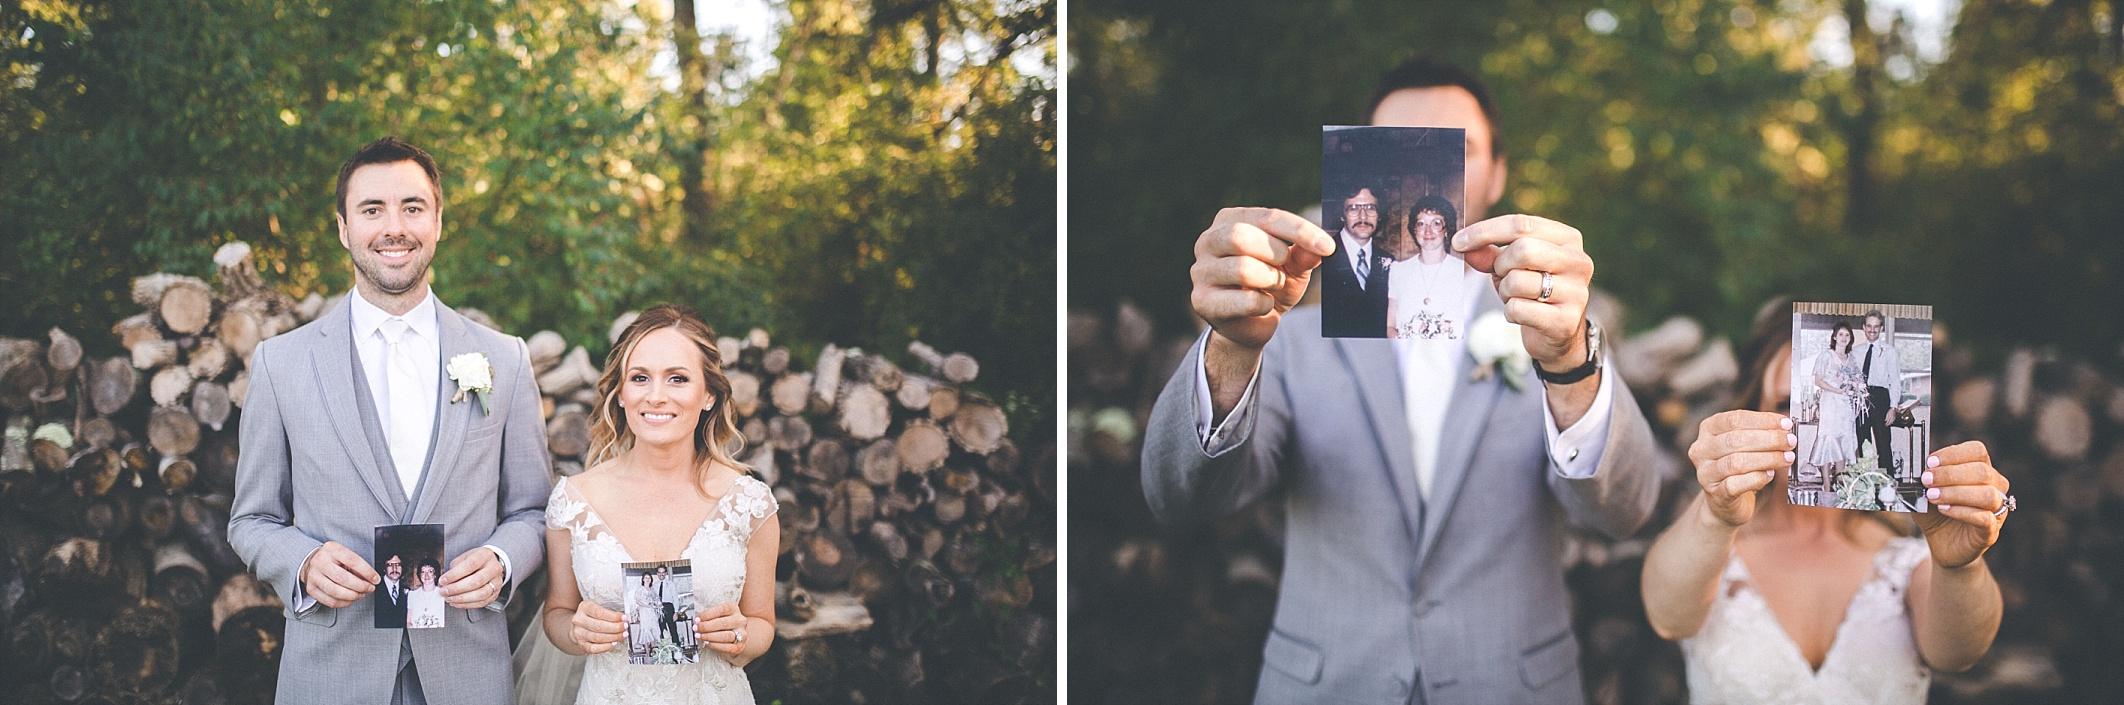 wedding-photographer-dayton-ohio_0203.jpg